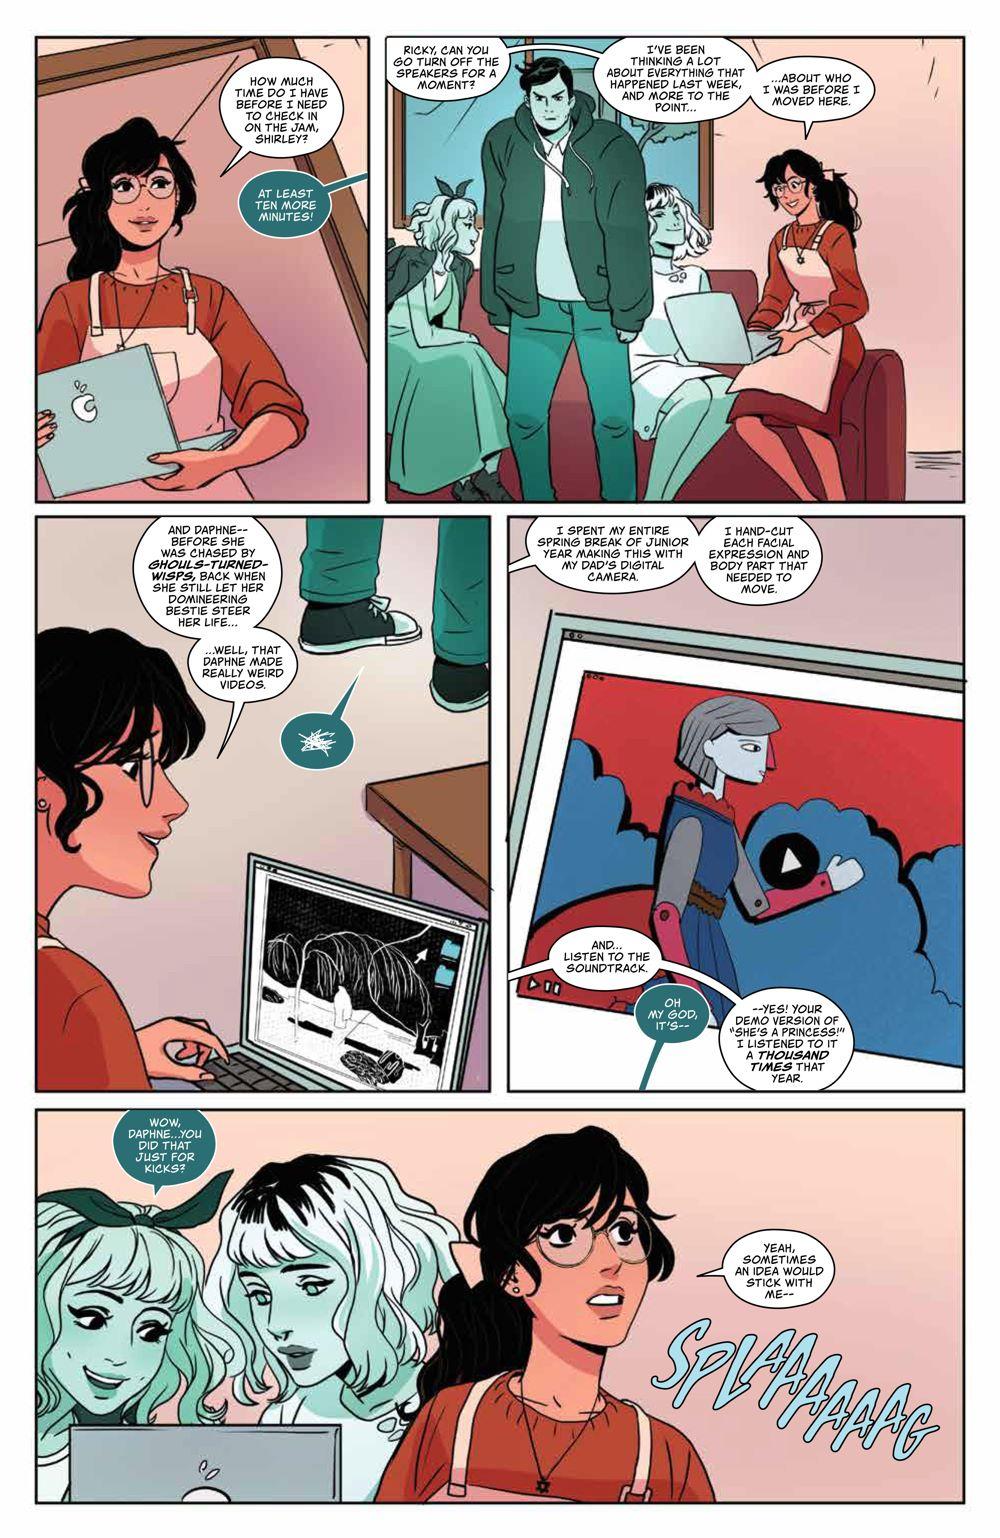 GhostedInLA_v3_SC_PRESS_15 ComicList Previews: GHOSTED IN L.A. VOLUME 3 TP